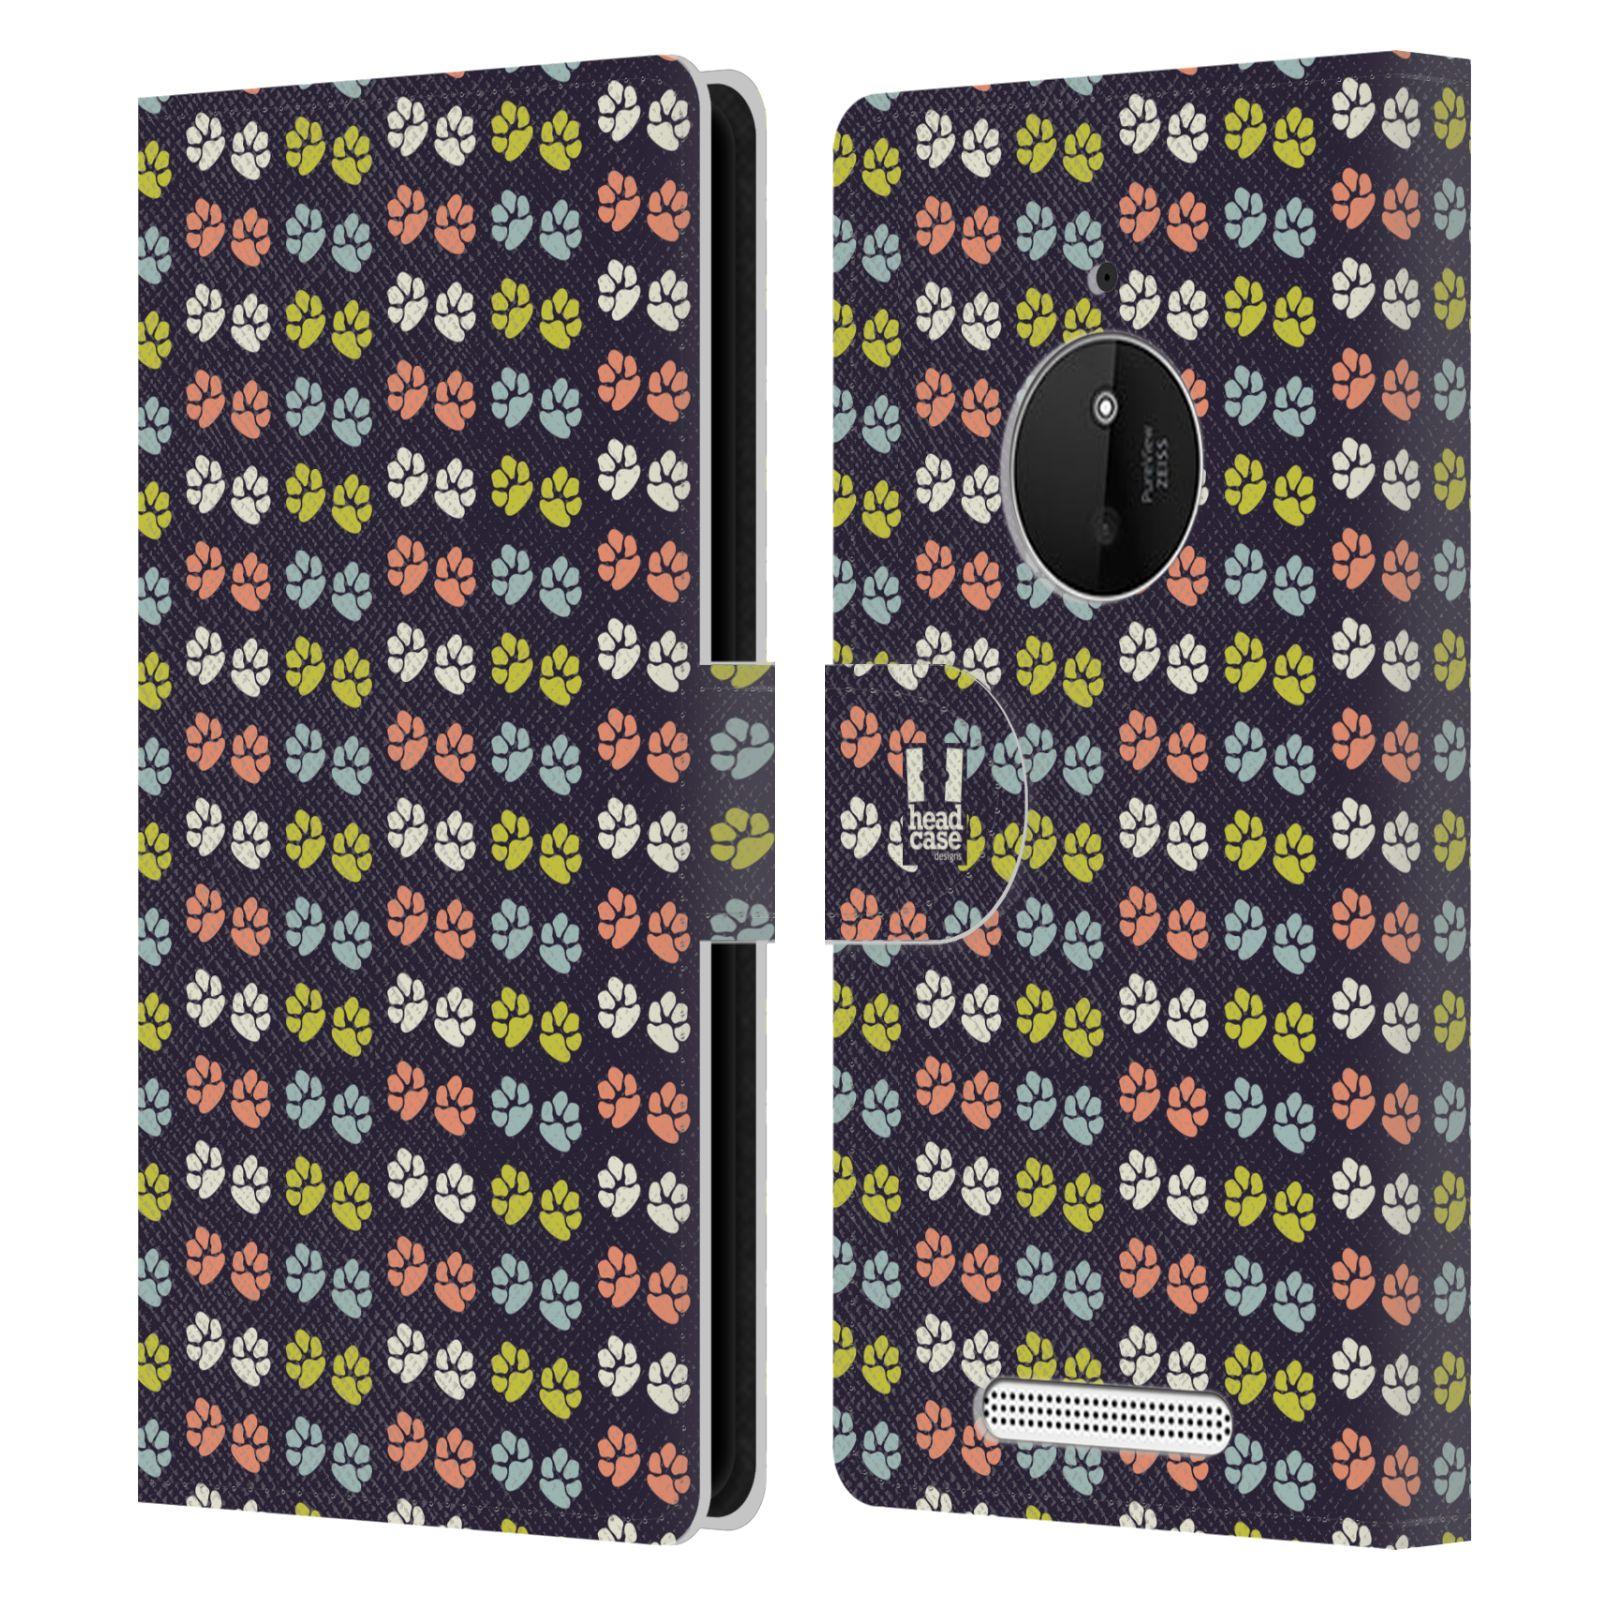 HEAD CASE Flipové pouzdro pro mobil NOKIA LUMIA 830 Pejsek ťapky barevné RETRO